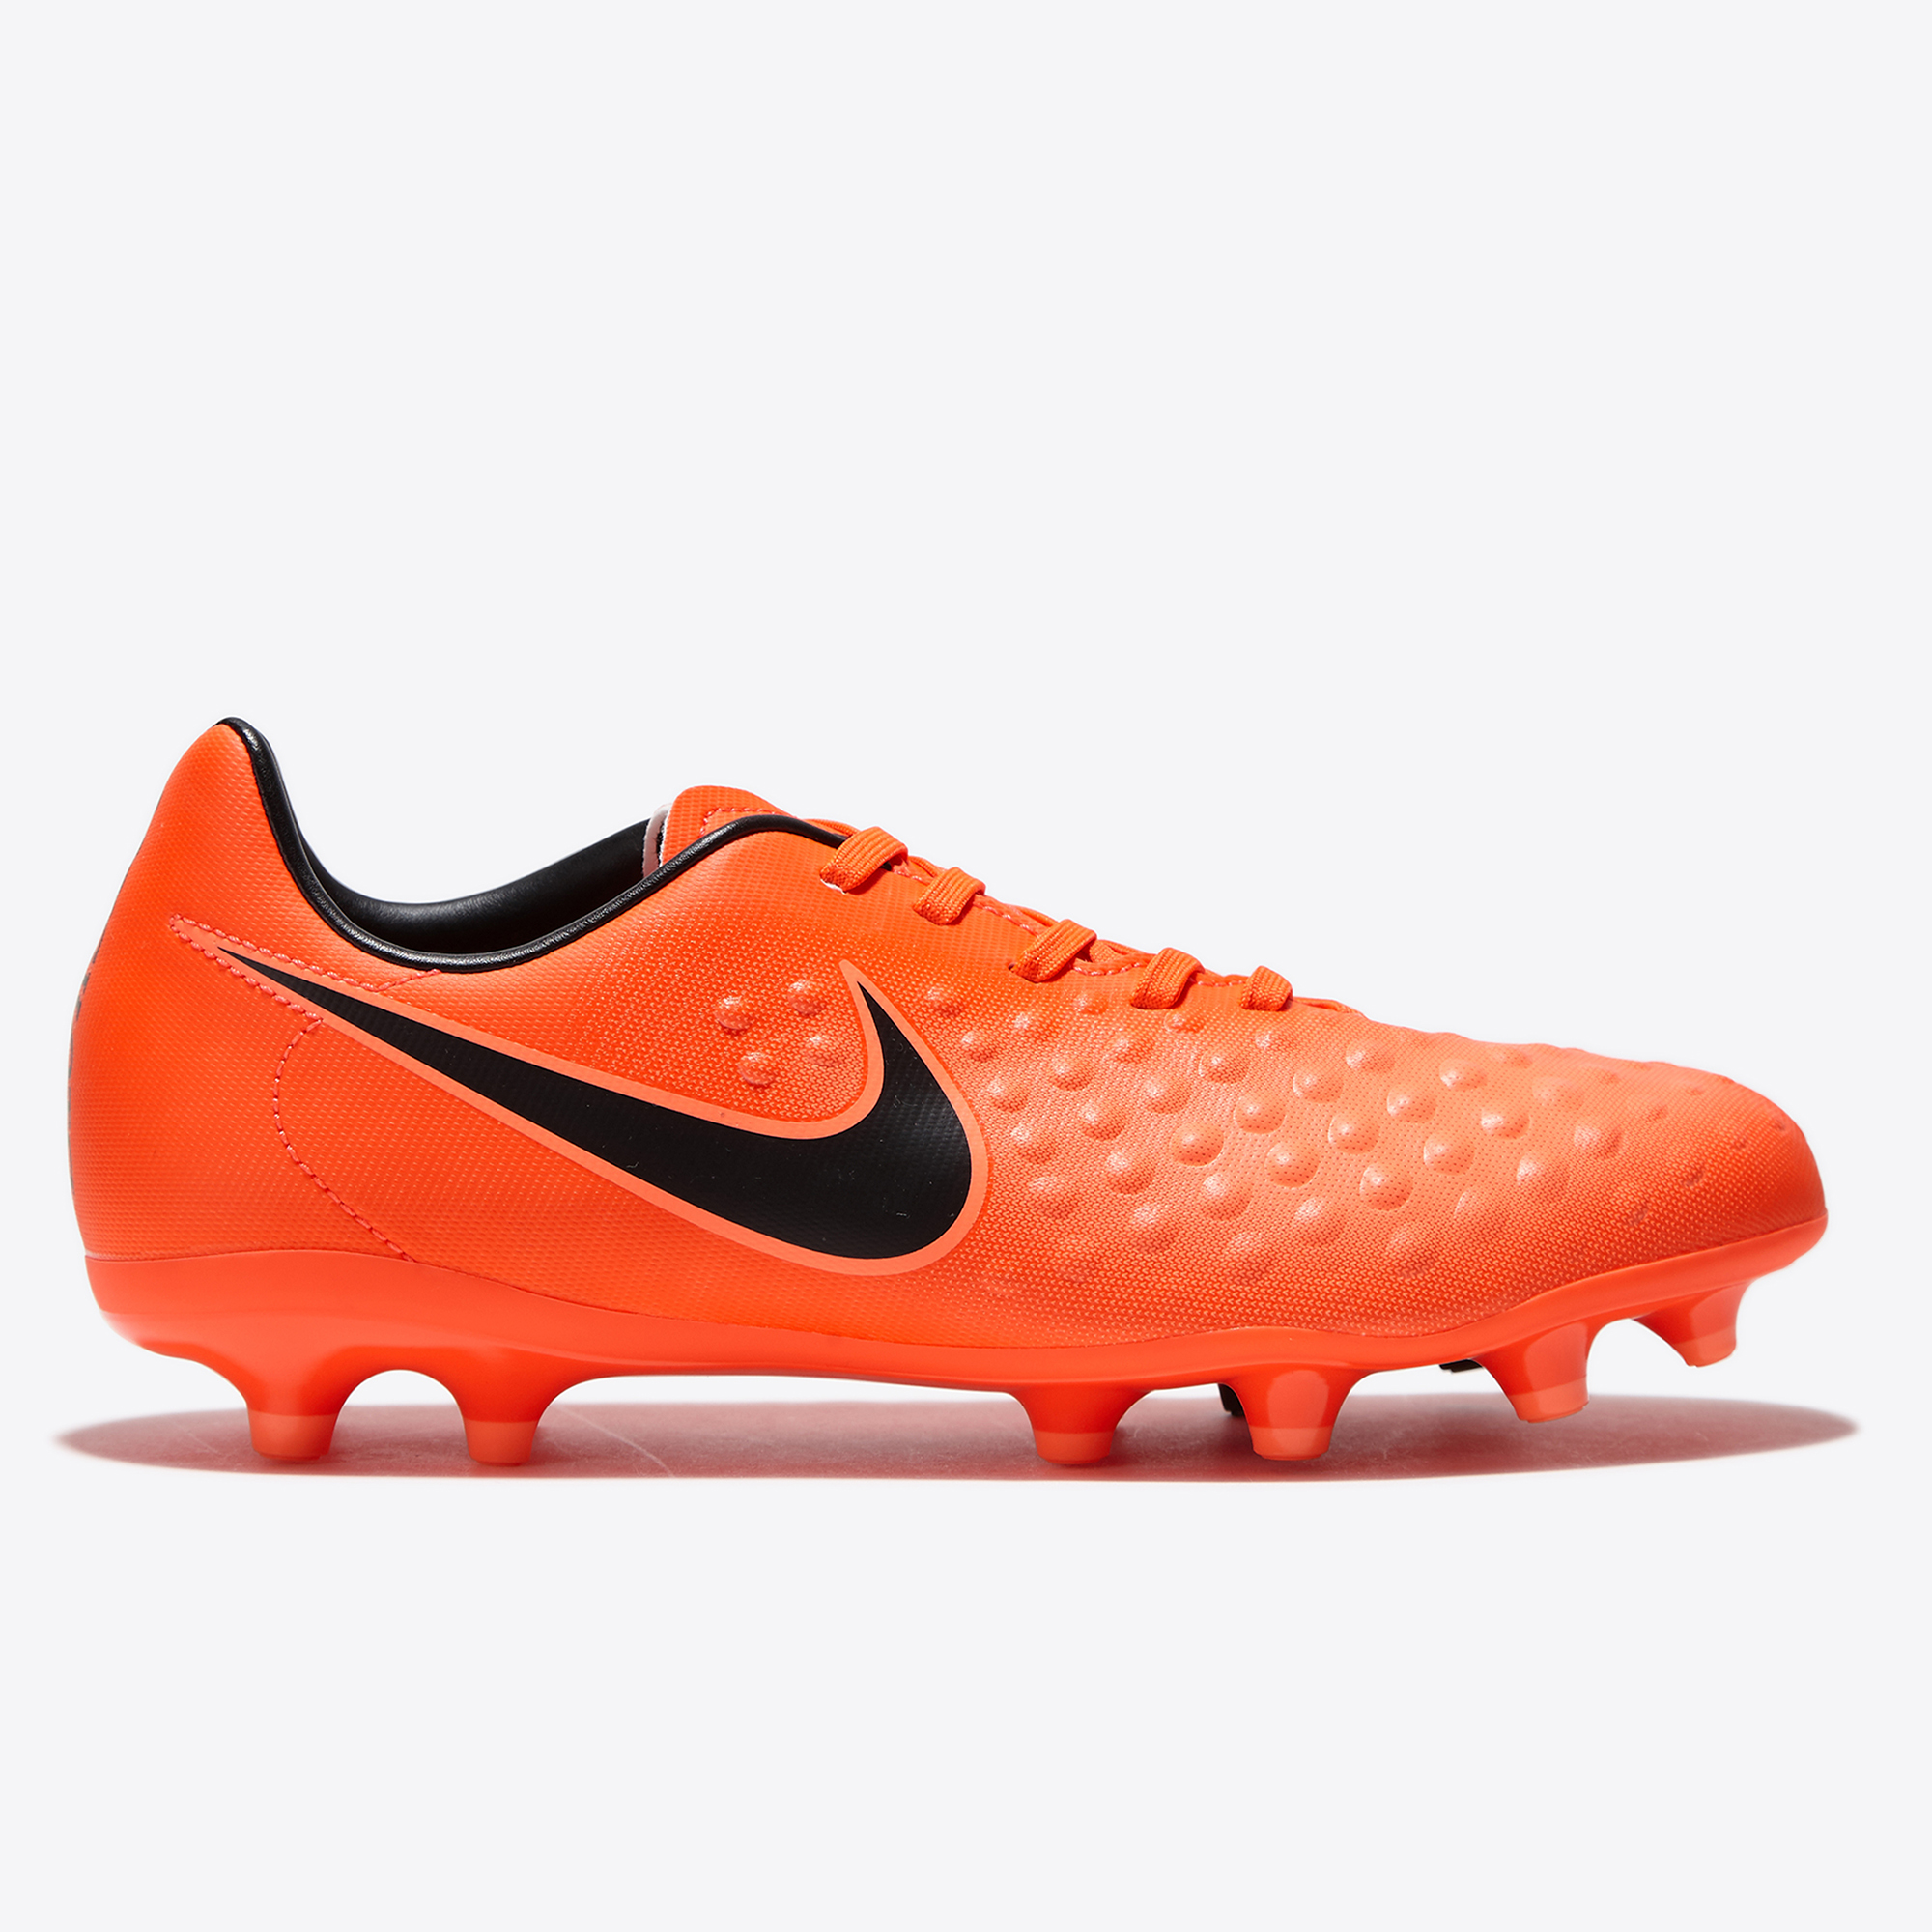 Nike Magista Opus II Firm Ground Football Boots - Total Crimson/Black/